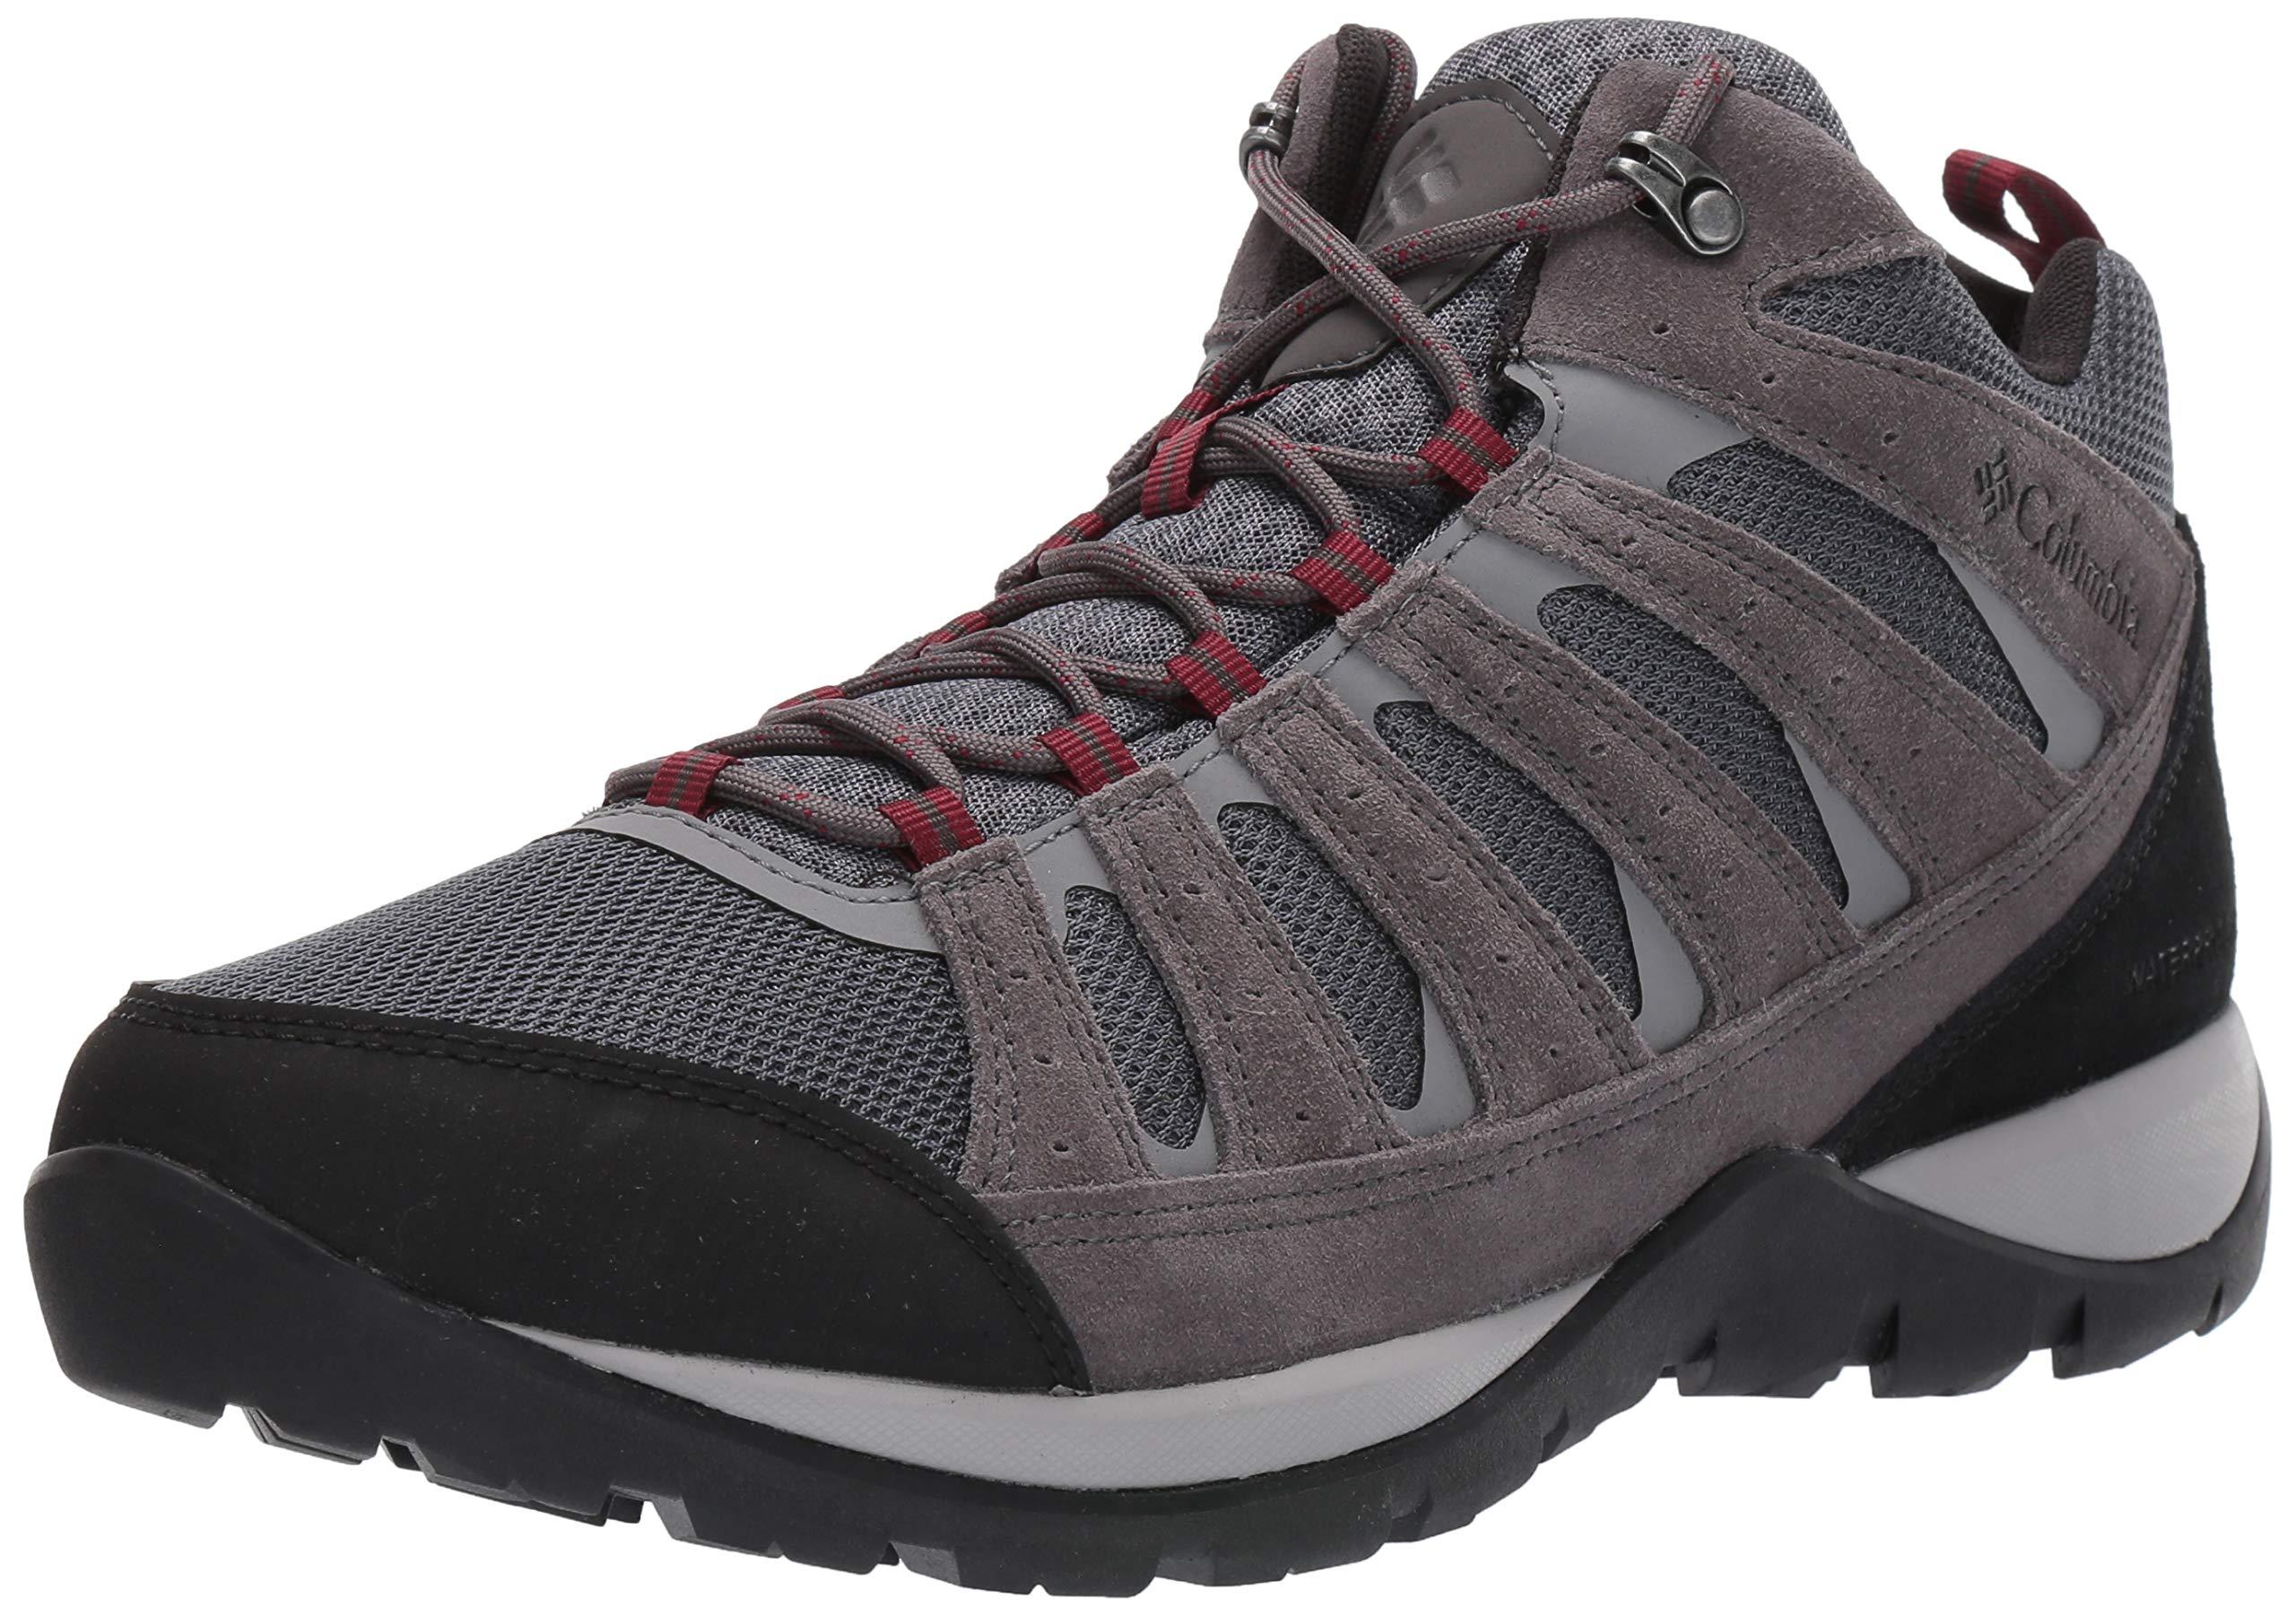 Columbia Men's Redmond V2 MID Waterproof Hiking Shoe, Graphite, red Jasper, 9 Wide US by Columbia